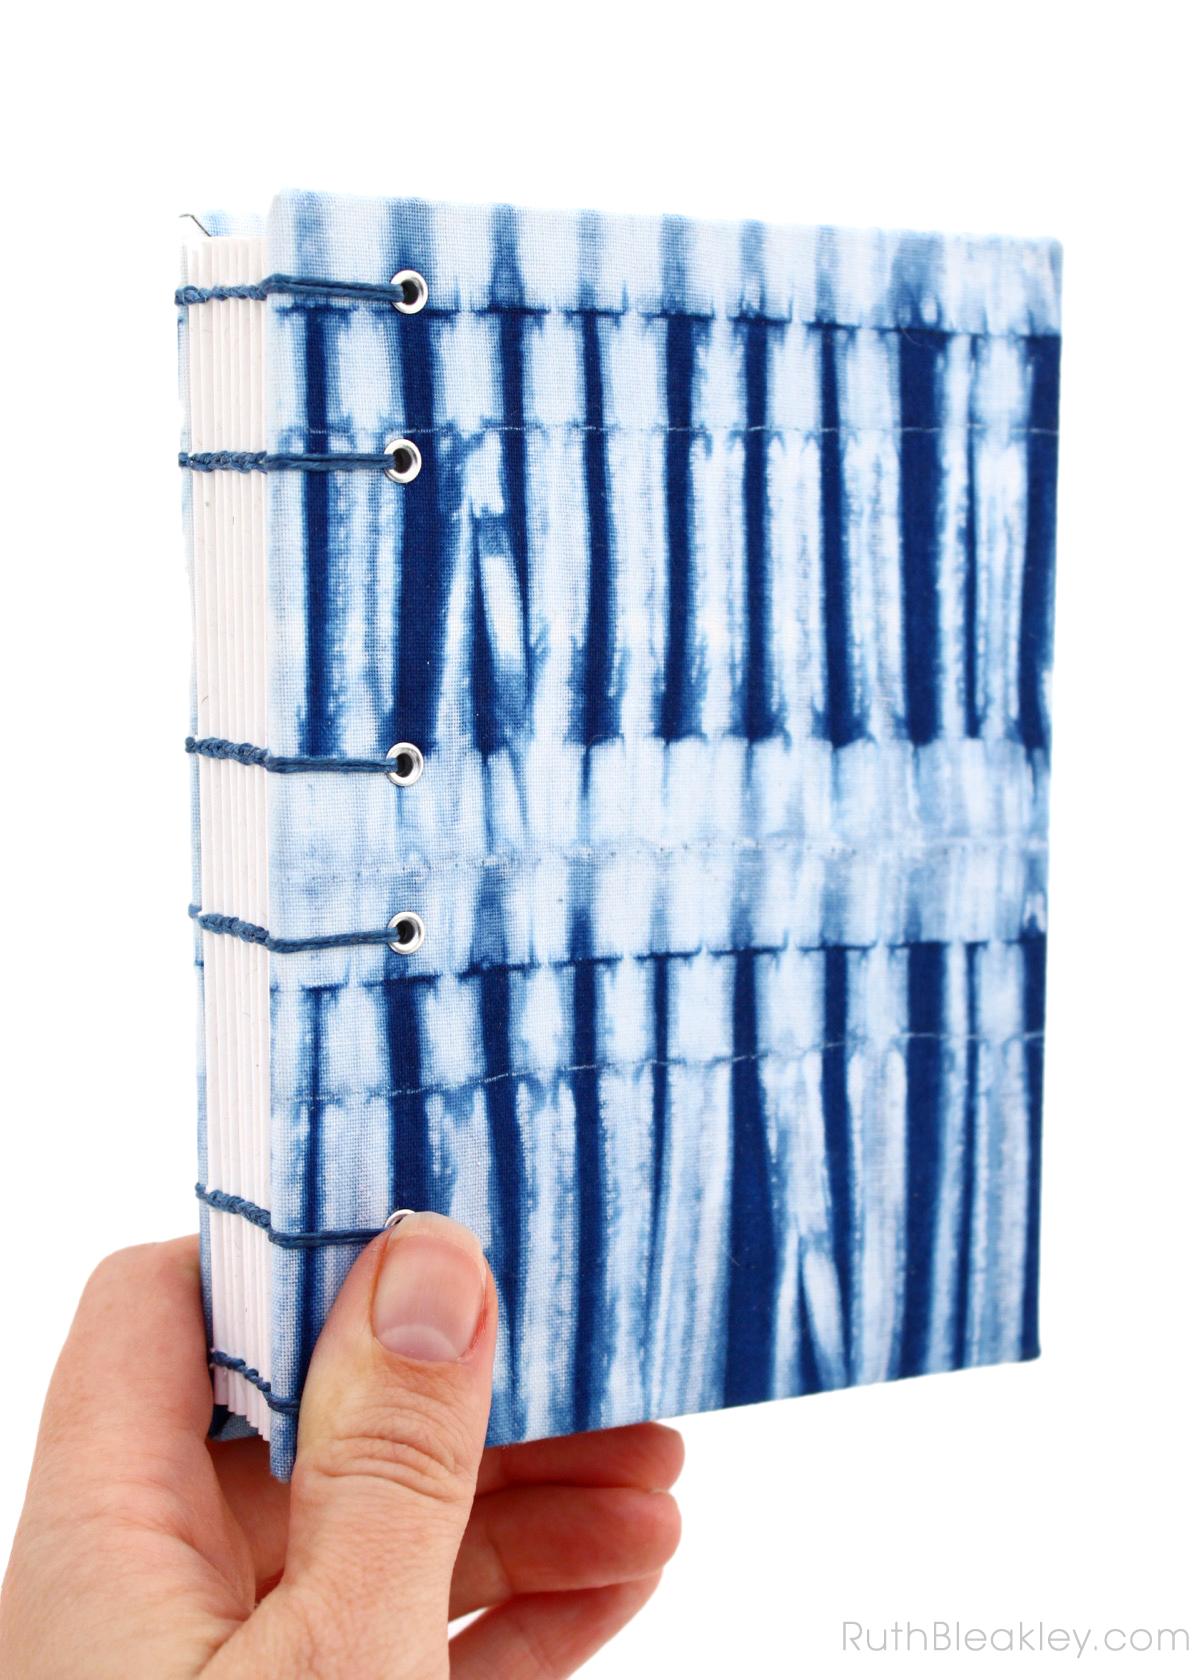 Indigo Shibori Journal handmade by book artist Ruth Bleakley with fabric from Cape Cod Shibori - 7